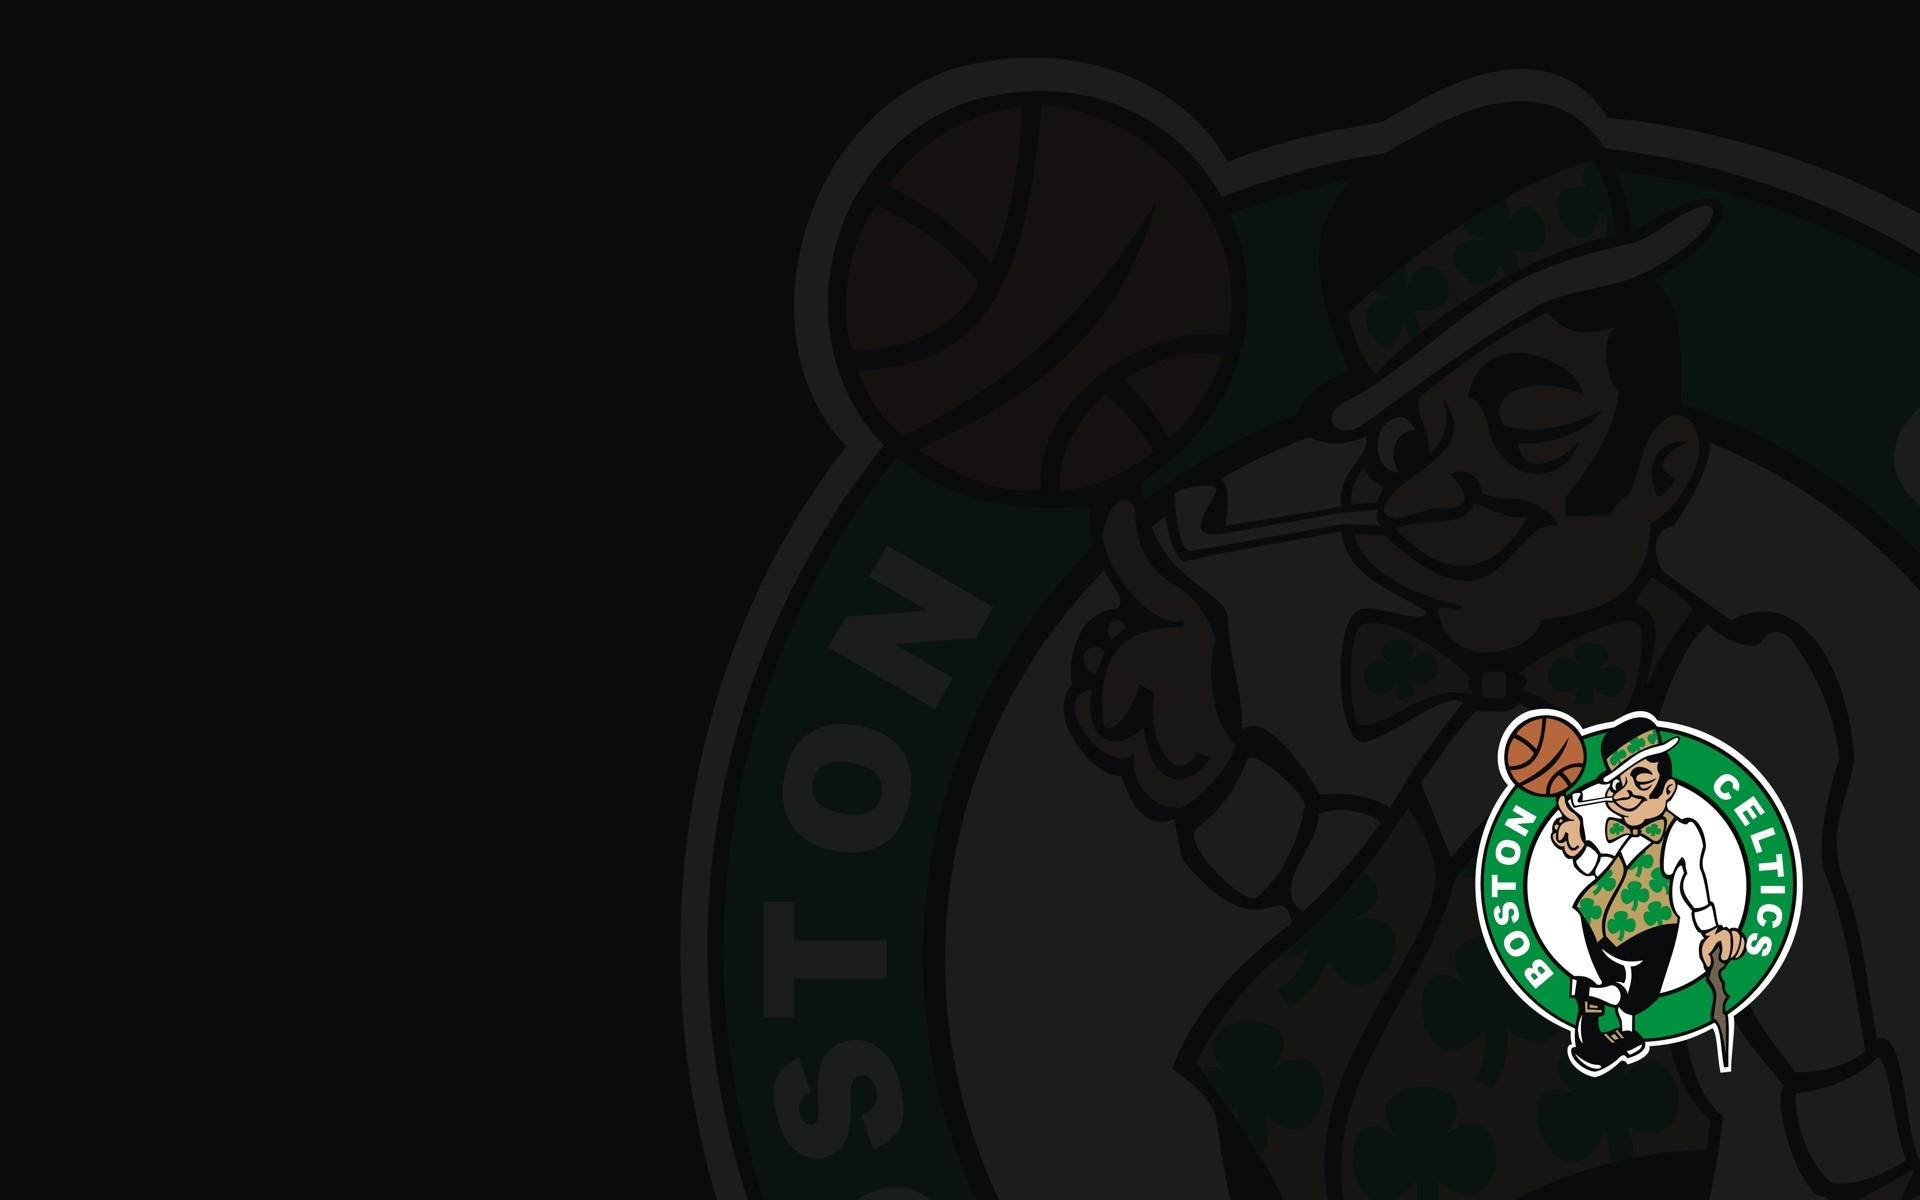 Boston Celtics Wallpapers - Wallpaper Cave  |Boston Celtics Wallpaper